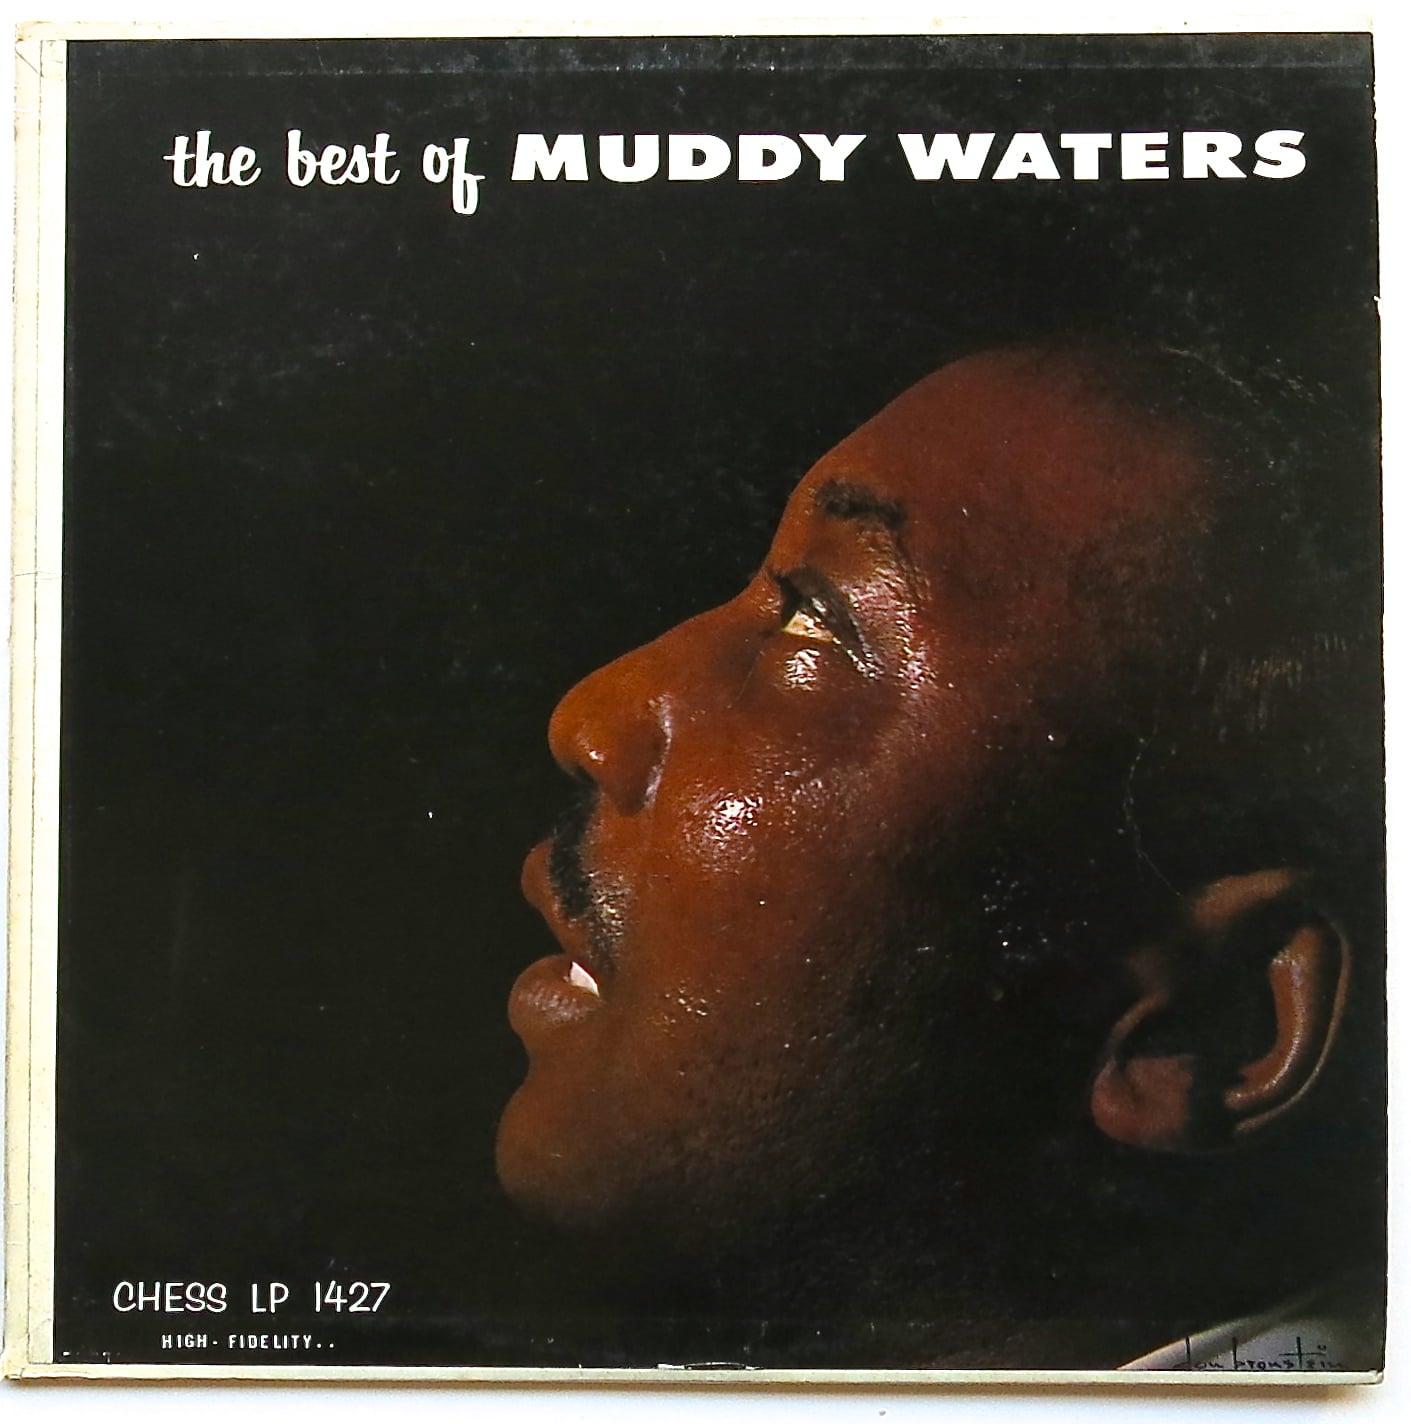 Muddy Waters Mint Best Of Muddy Waters Chess 1st Press